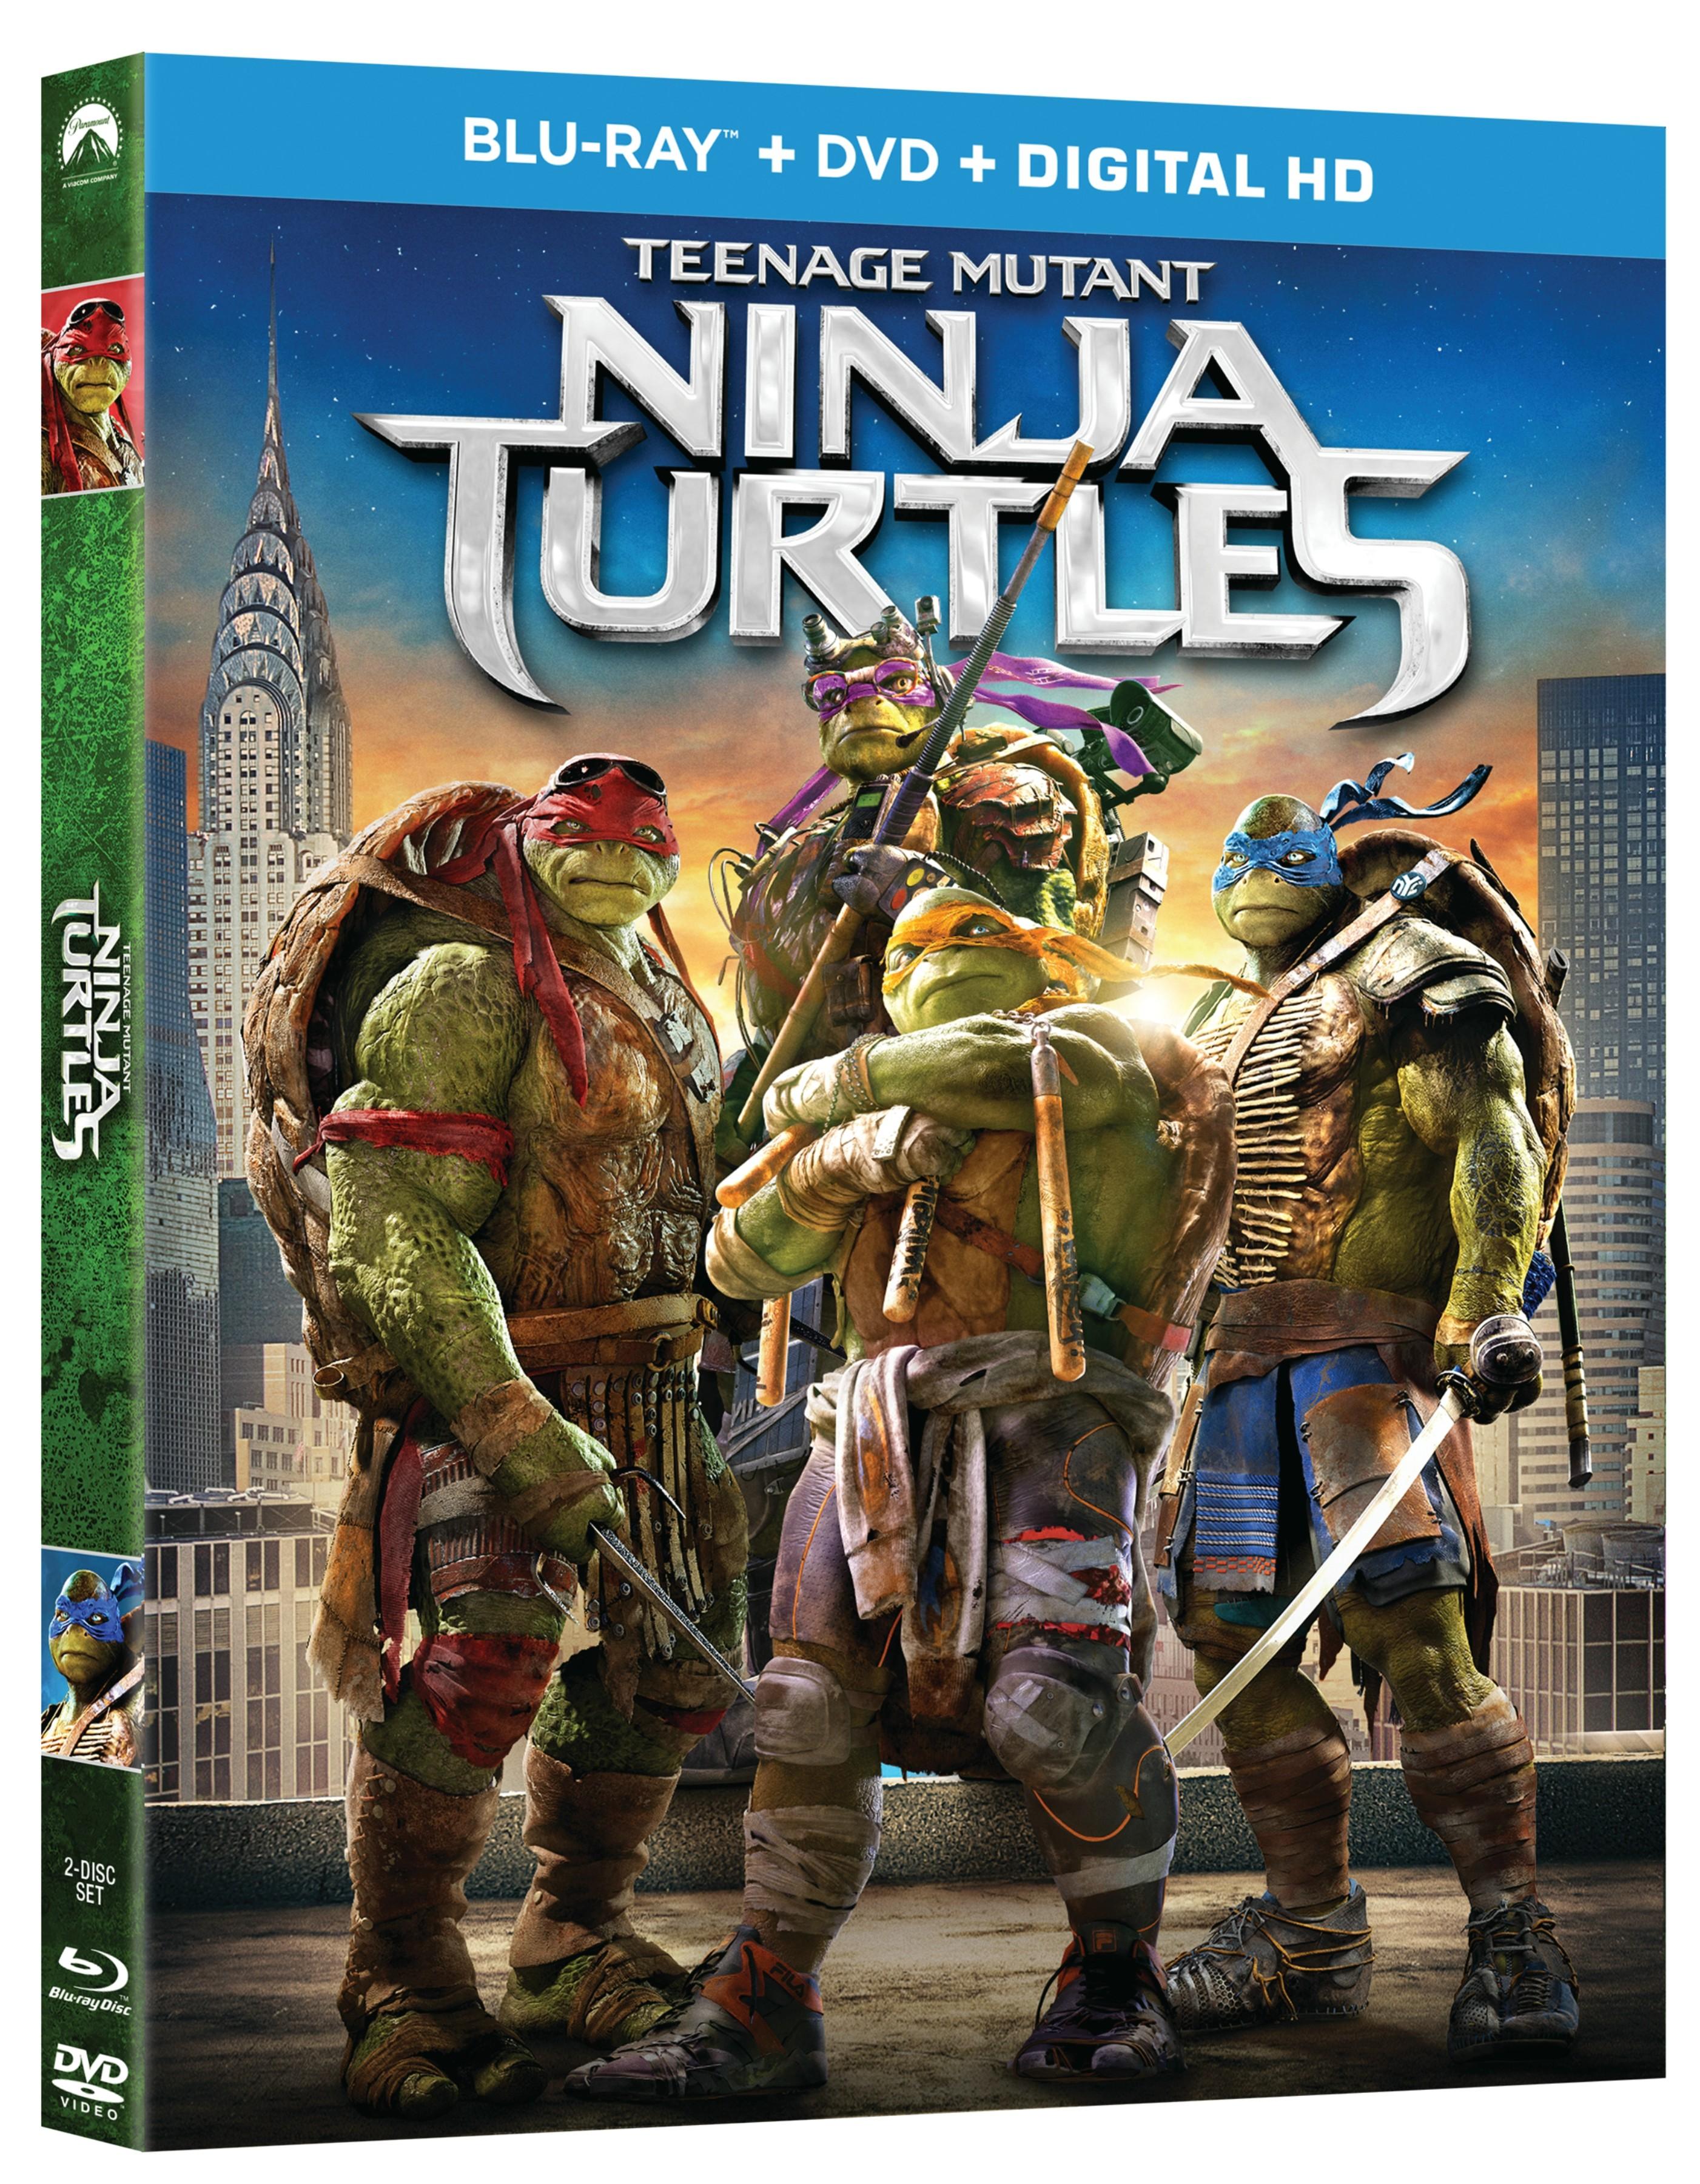 Teenage Mutant Ninja Turtles Coloring Pages - Coloring Home | 3600x2803